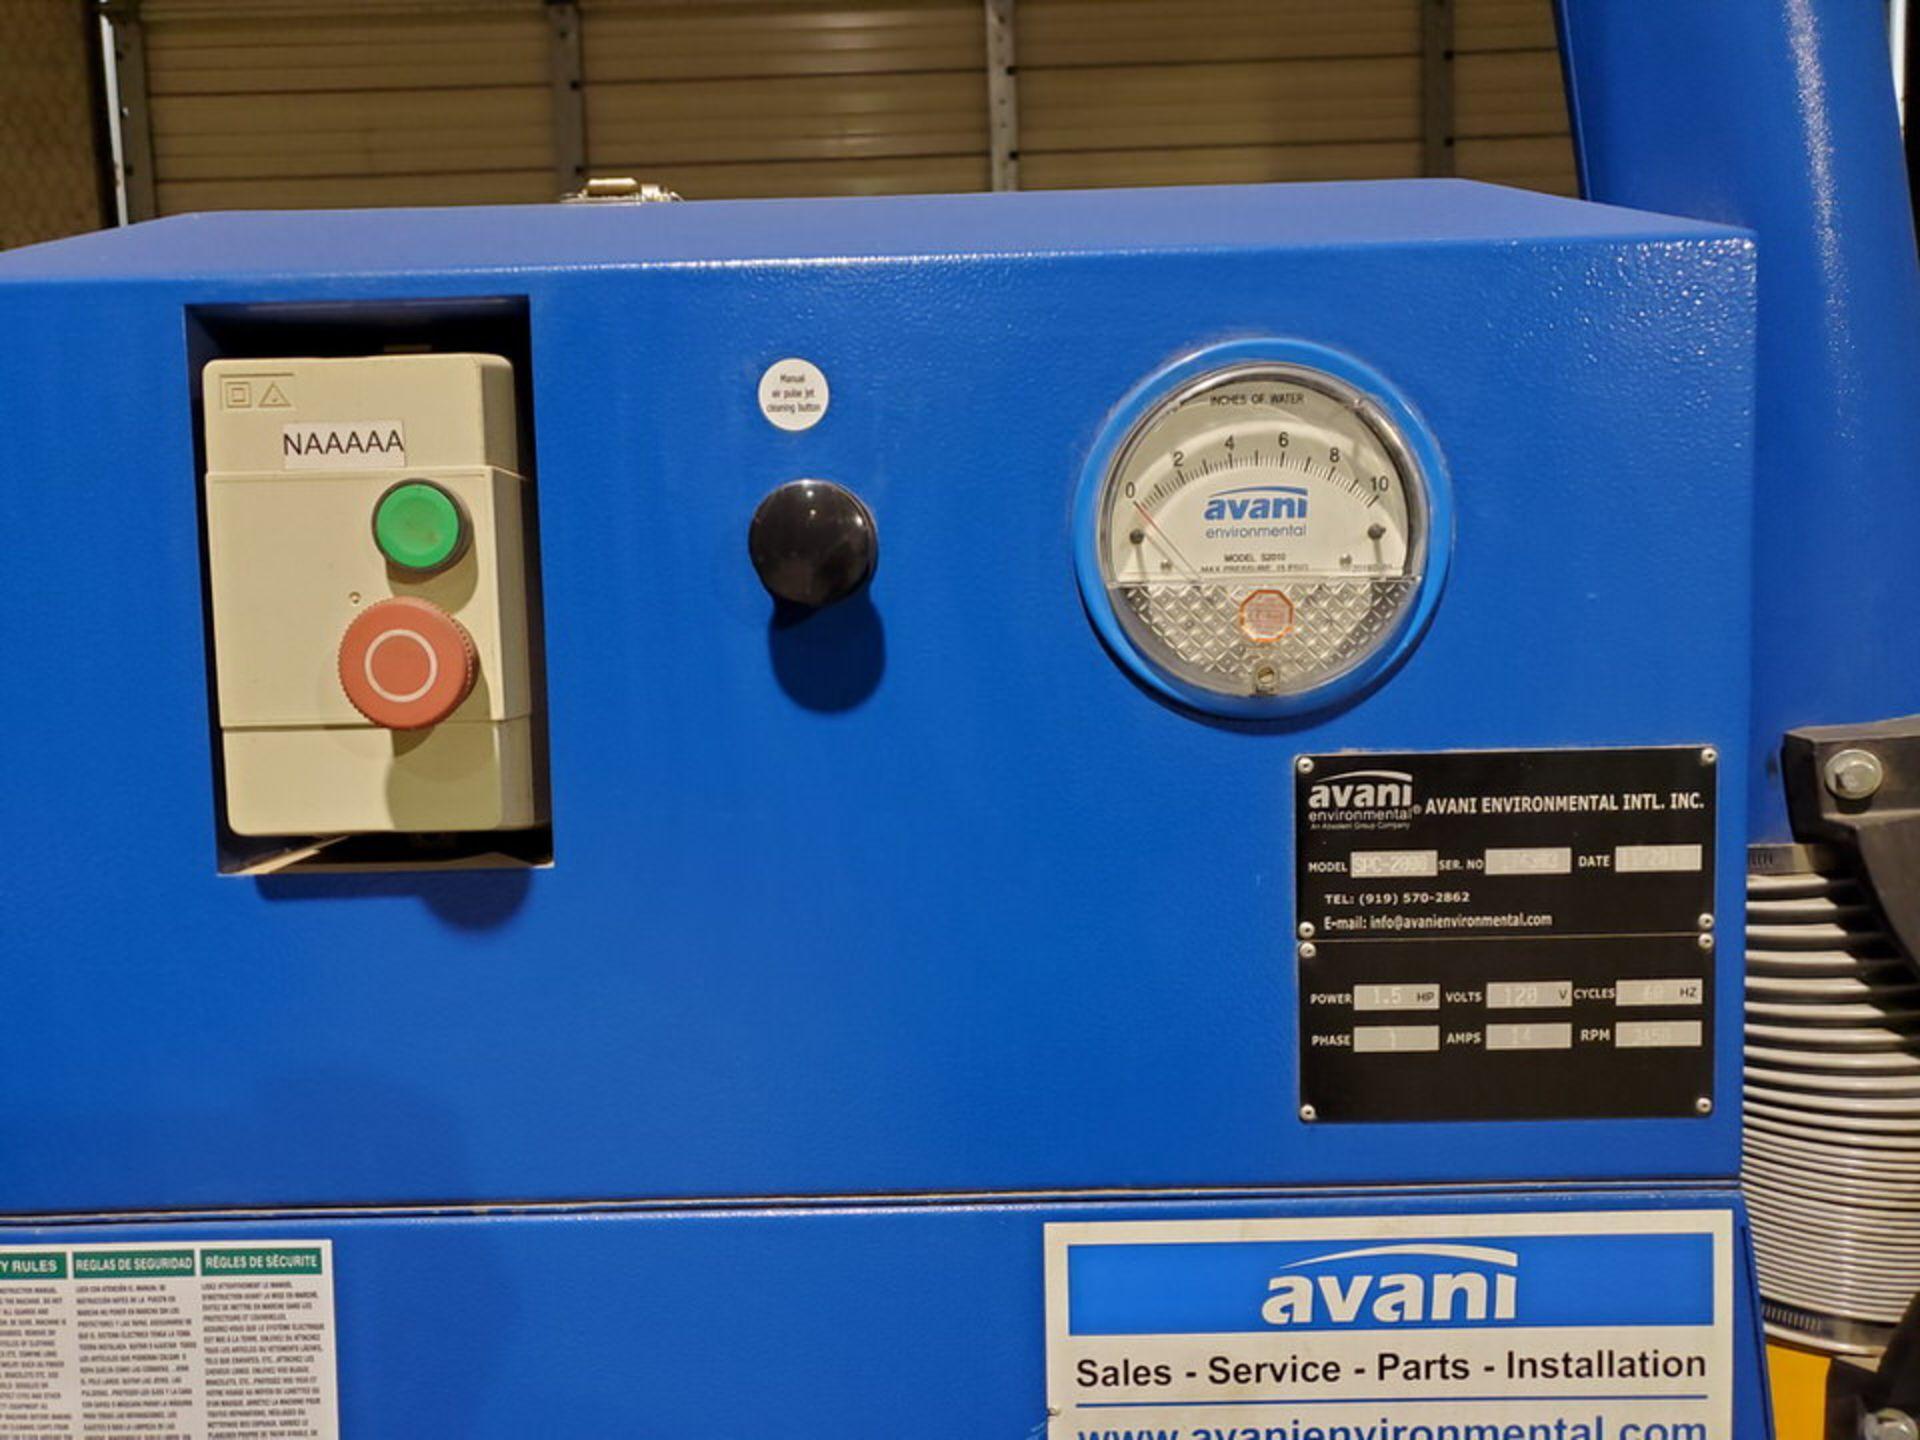 2017 Avanti SPC-2000 Portable Dust Collector 1-1/2HP, 120V, 60HZ, 1PH, 14A, 3450RPM - Image 6 of 7